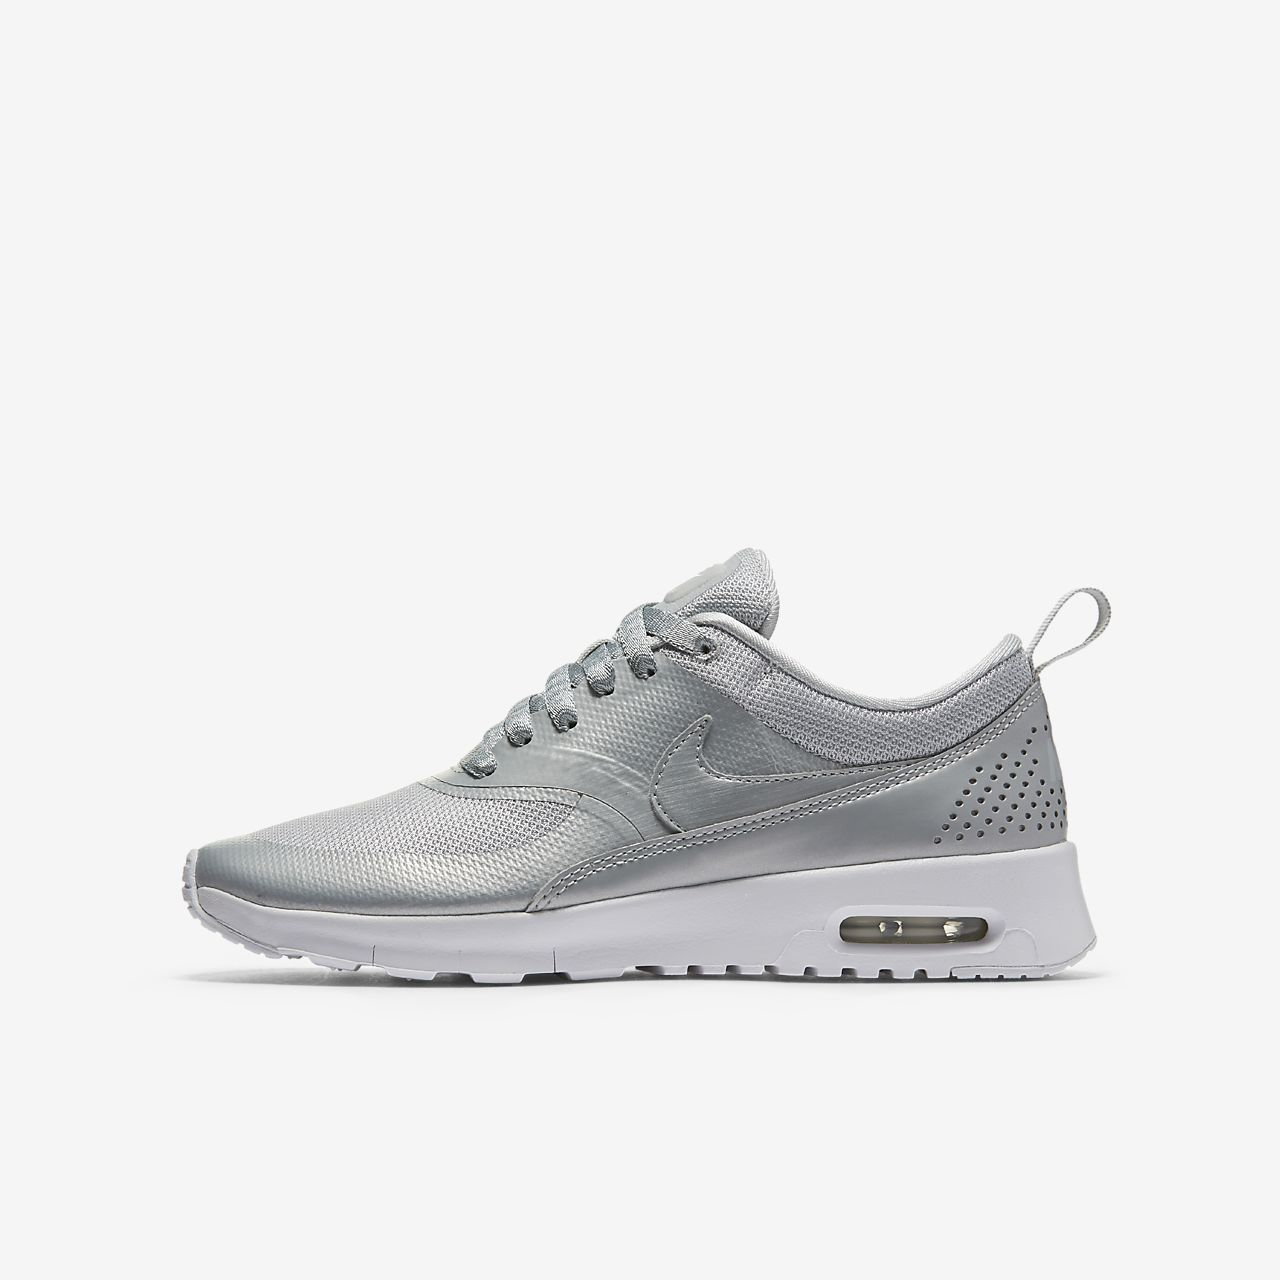 ... Nike Air Max Thea SE Older Kids' Shoe